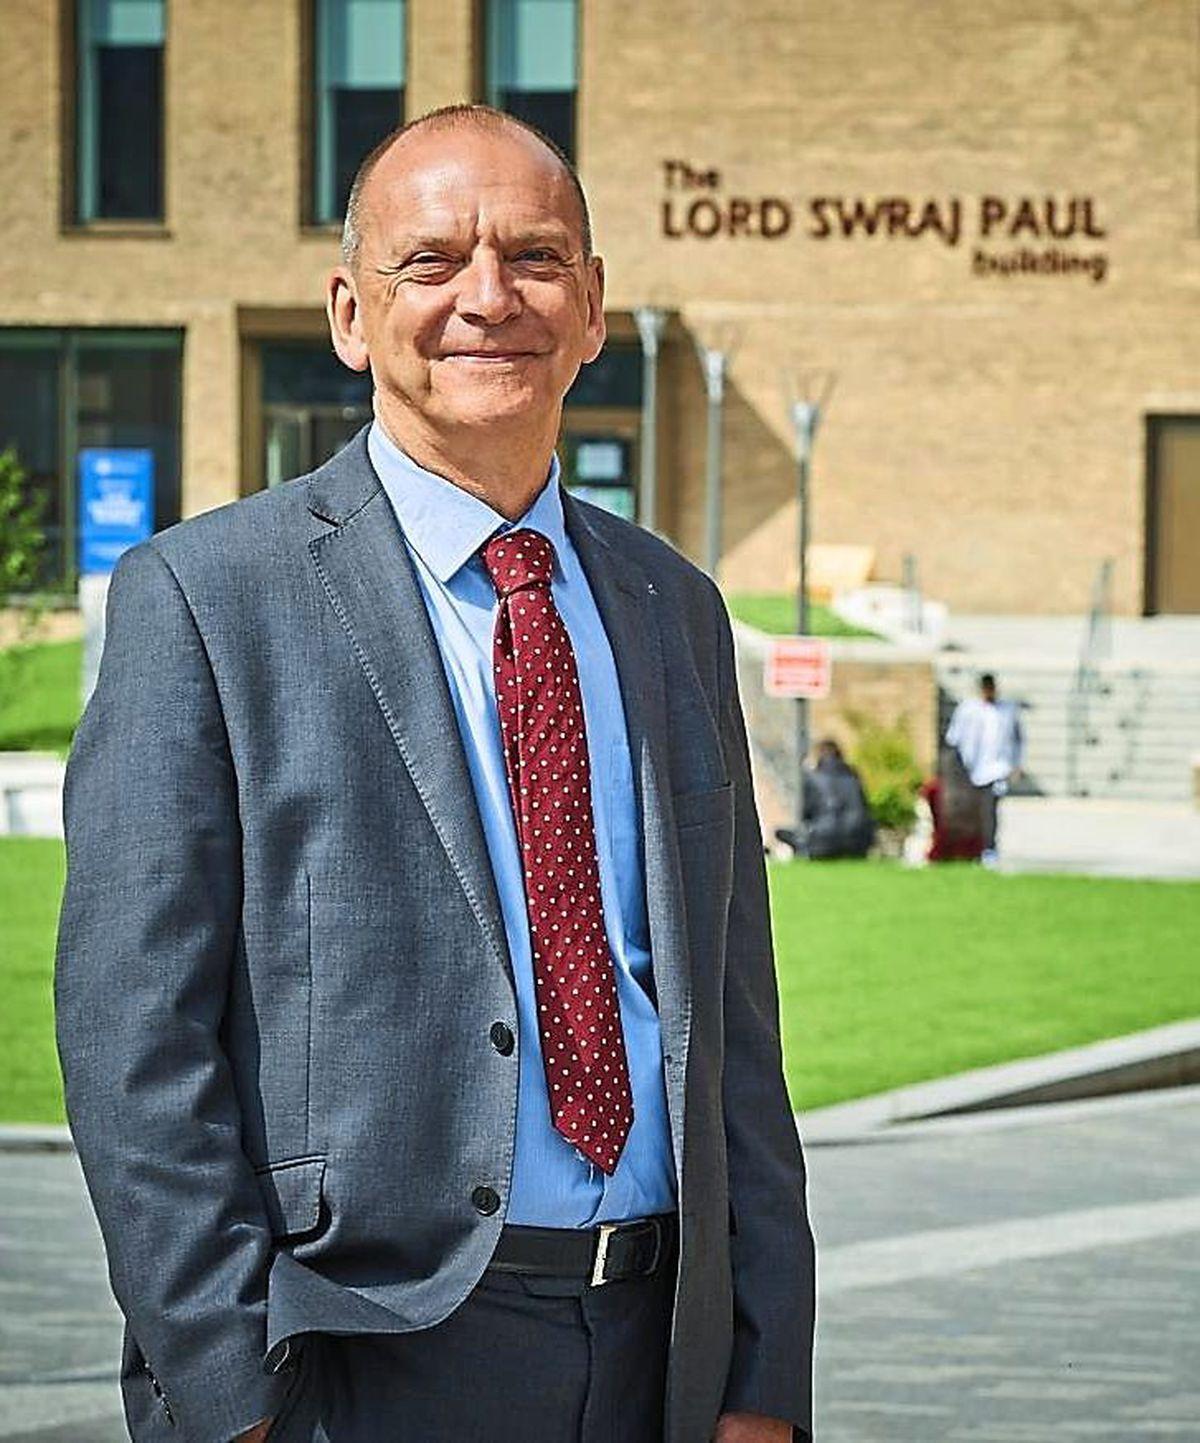 The University of Wolverhampton's vice-chancellor Professor Geoff Layer